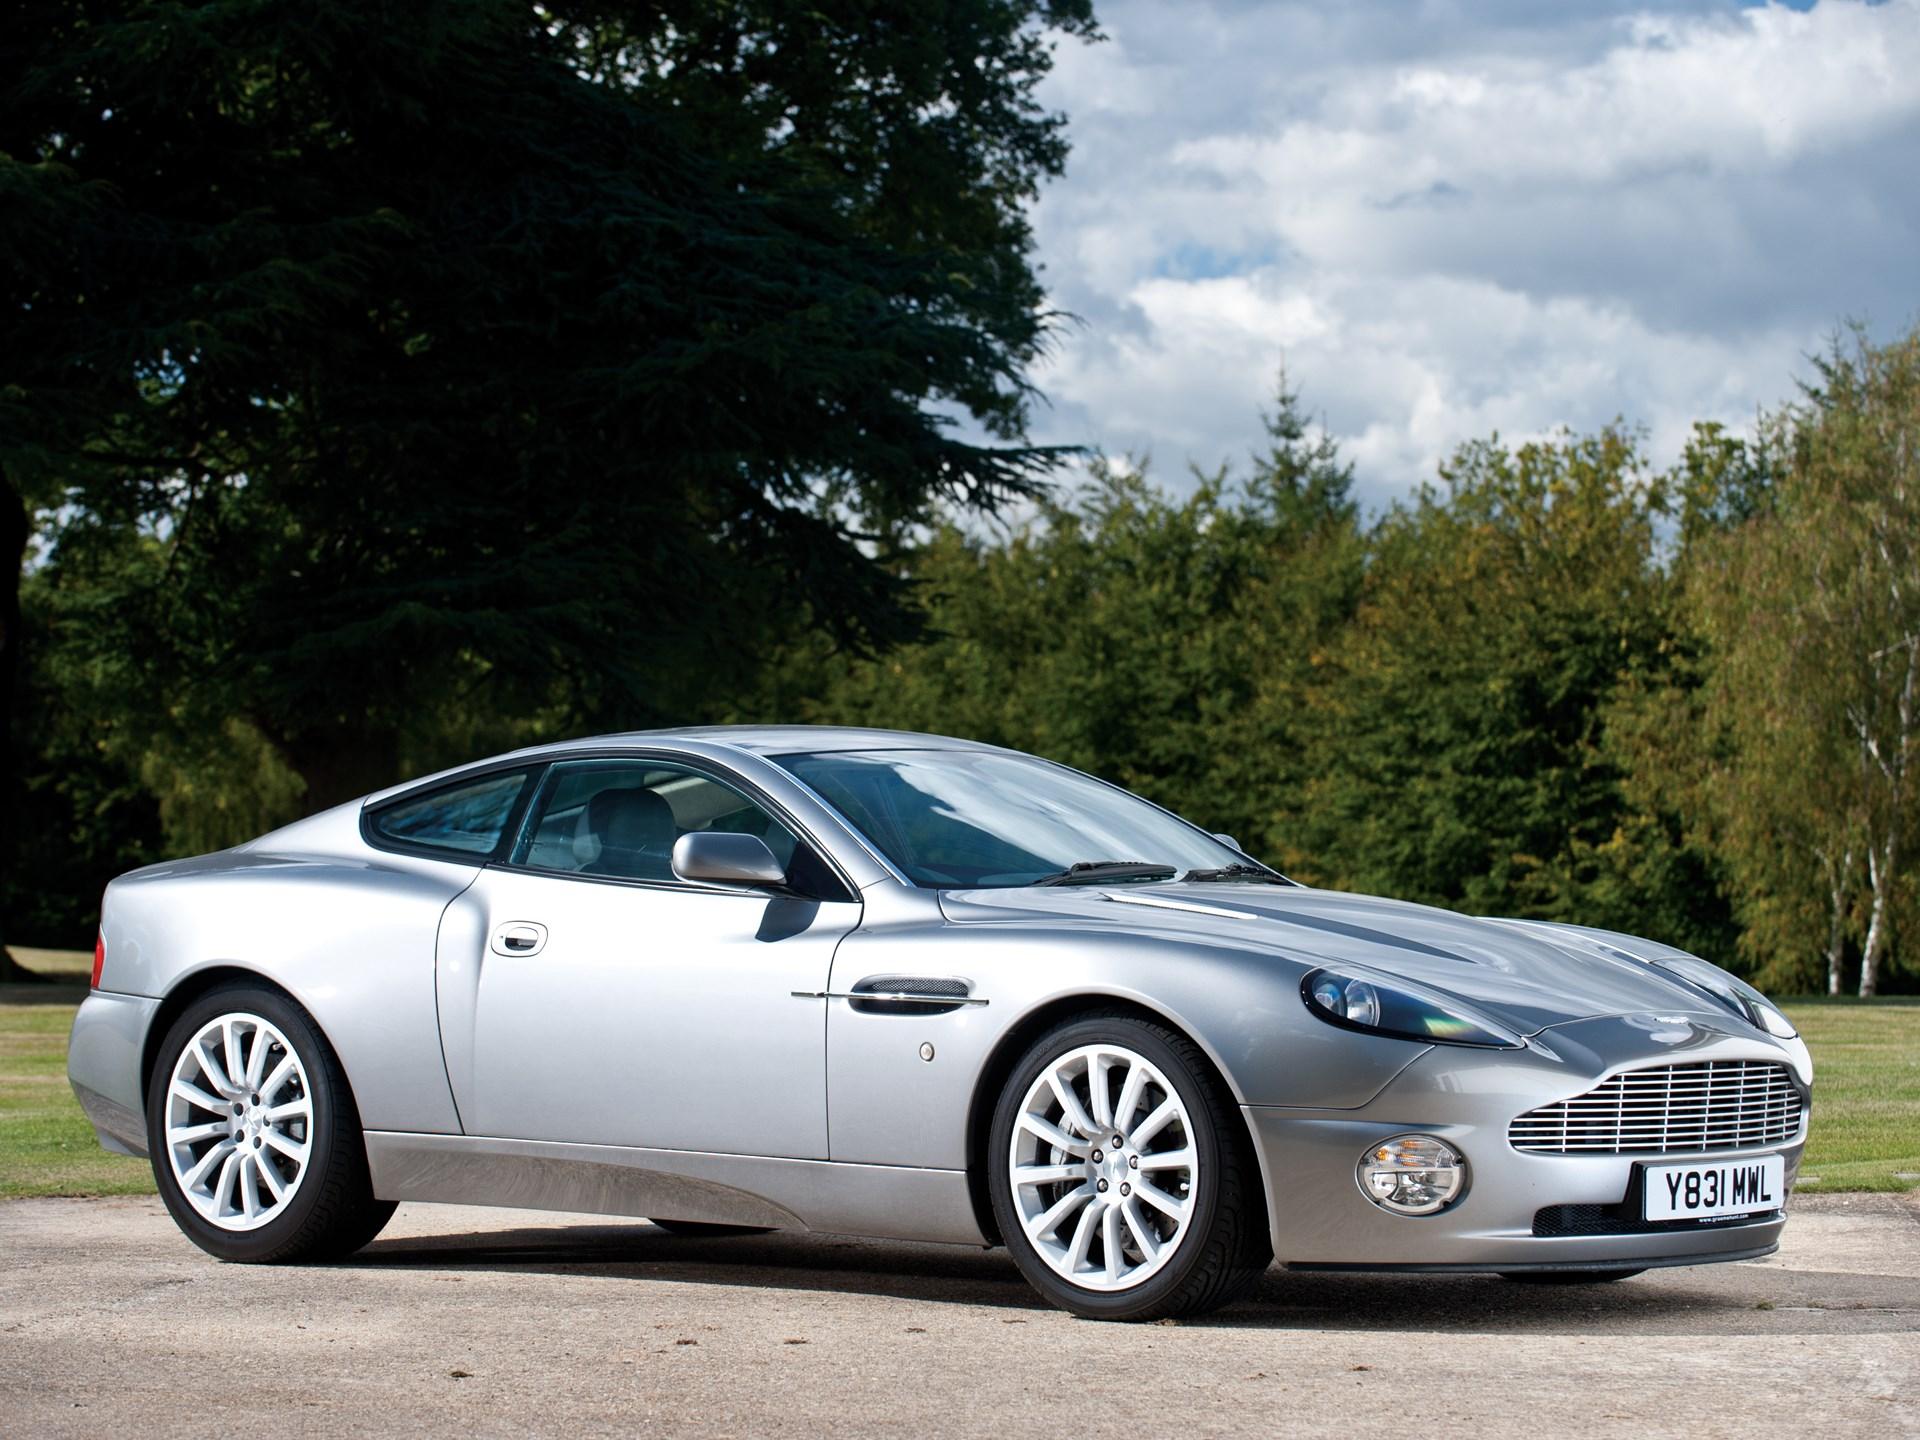 RM Sothebys Aston Martin Vanquish Prototype London - 2001 aston martin vanquish